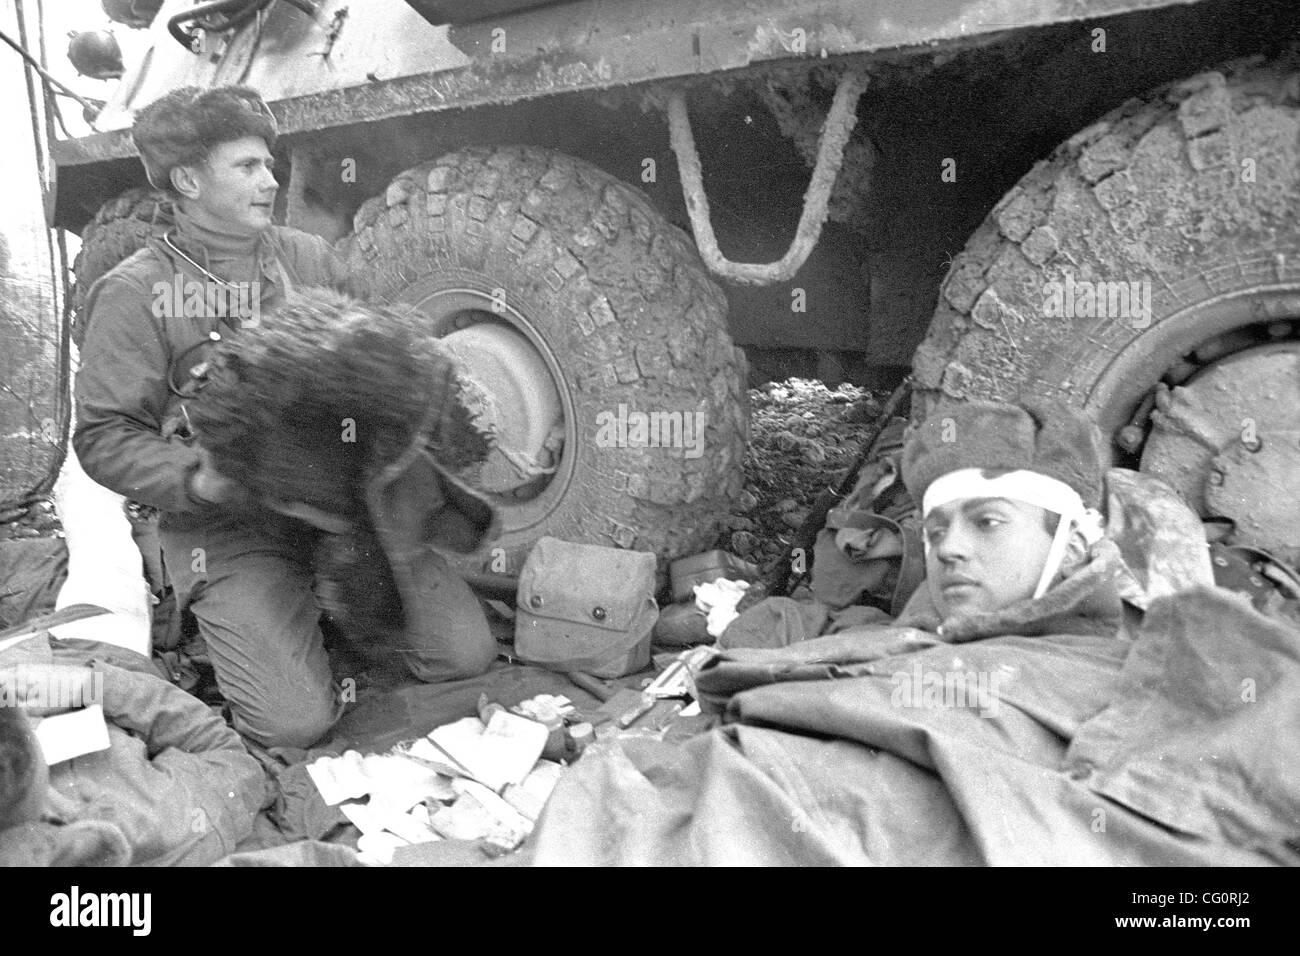 Soviet Afghanistan war - Page 6 Jul-12-2007-kabul-afghanistan-the-soviet-war-in-afghanistan-was-a-CG0RJ2